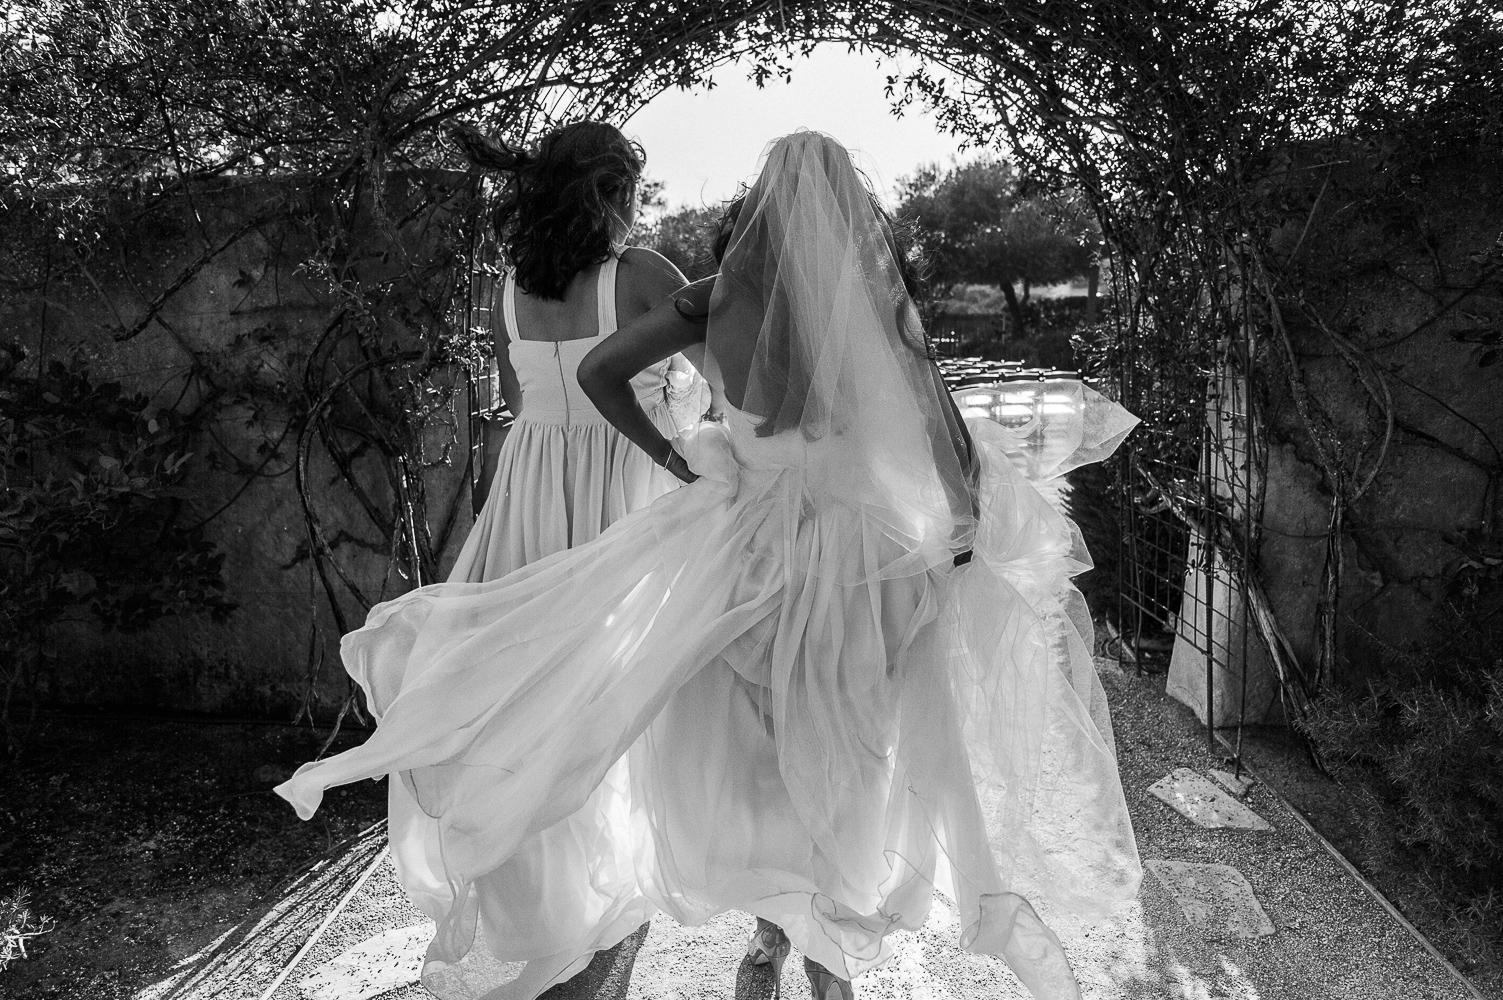 Destination wedding photographer Lexia Frank is a portland oregon fine art wedding photographer. bride walks through the entrance at her sunstone winery wedding in california. www.lexiafrank.com